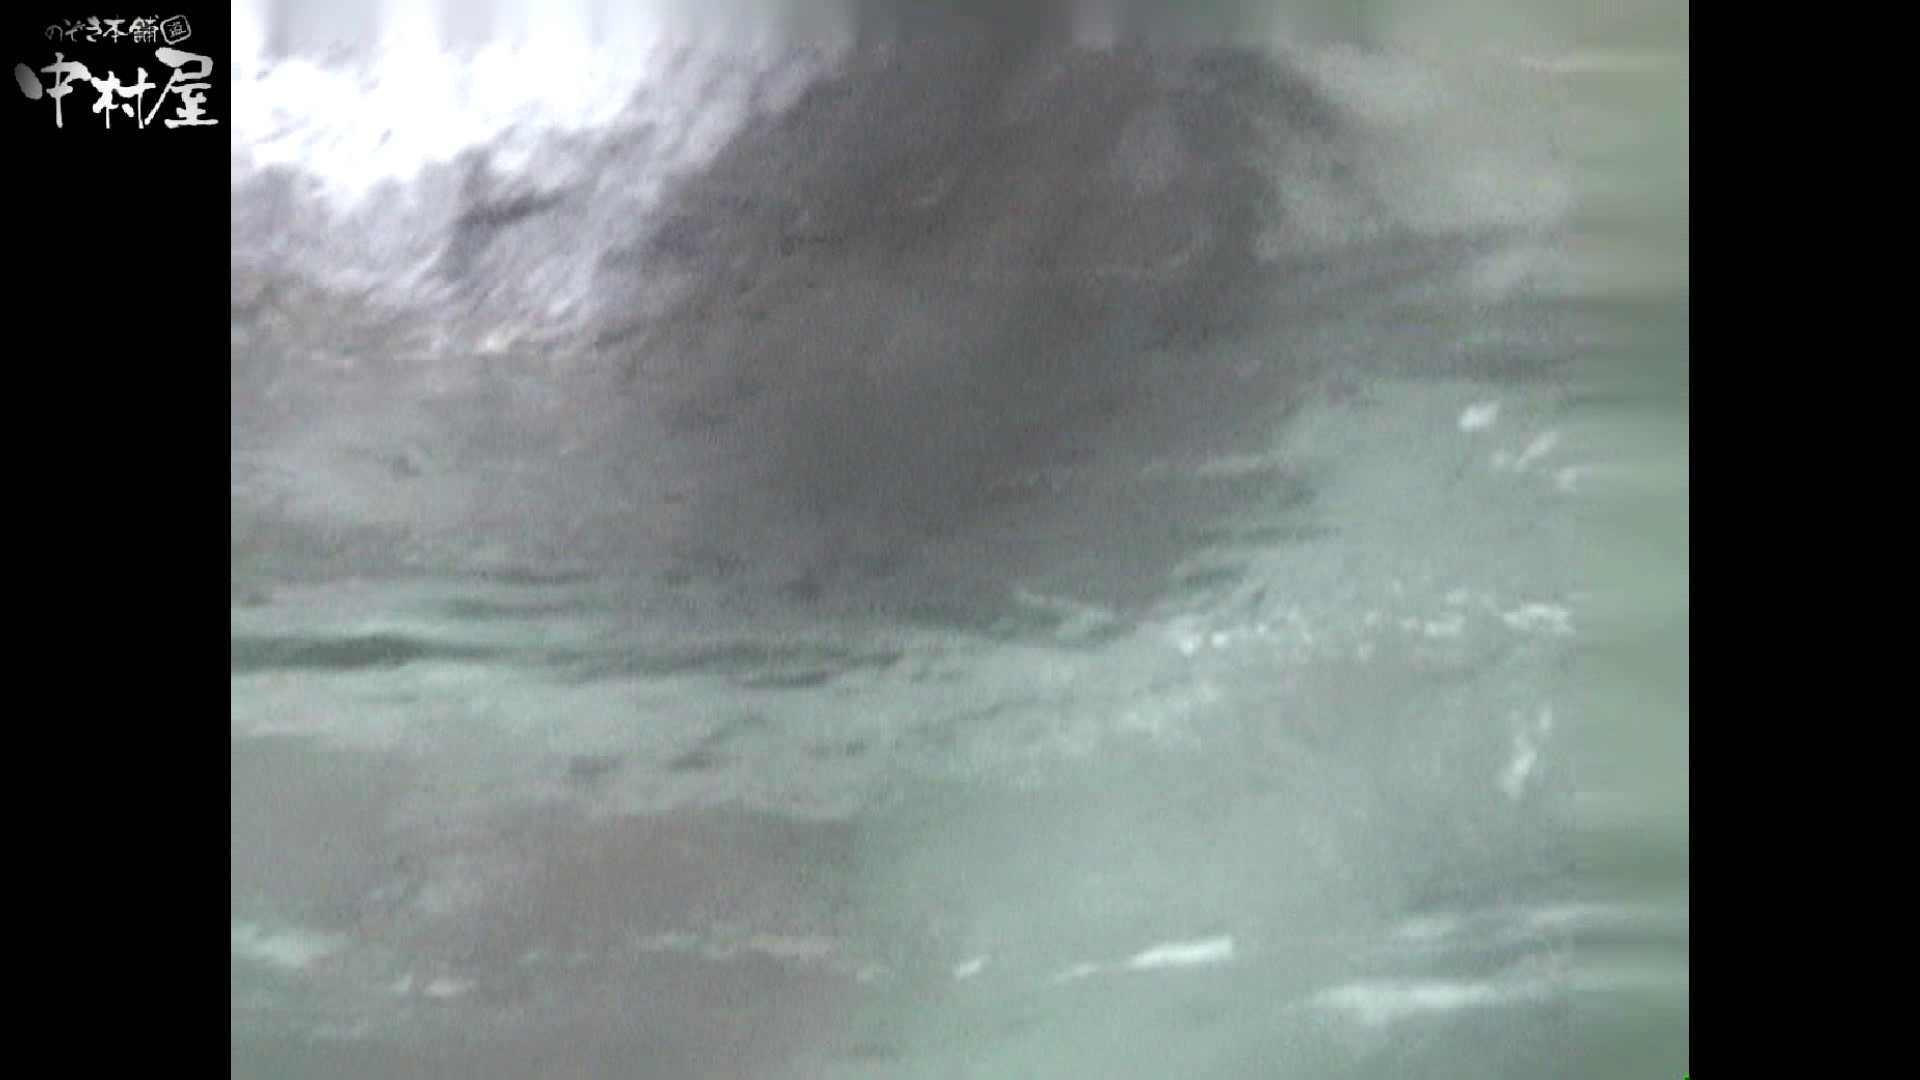 Aquaな露天風呂Vol.951 盗撮映像  93Pix 22